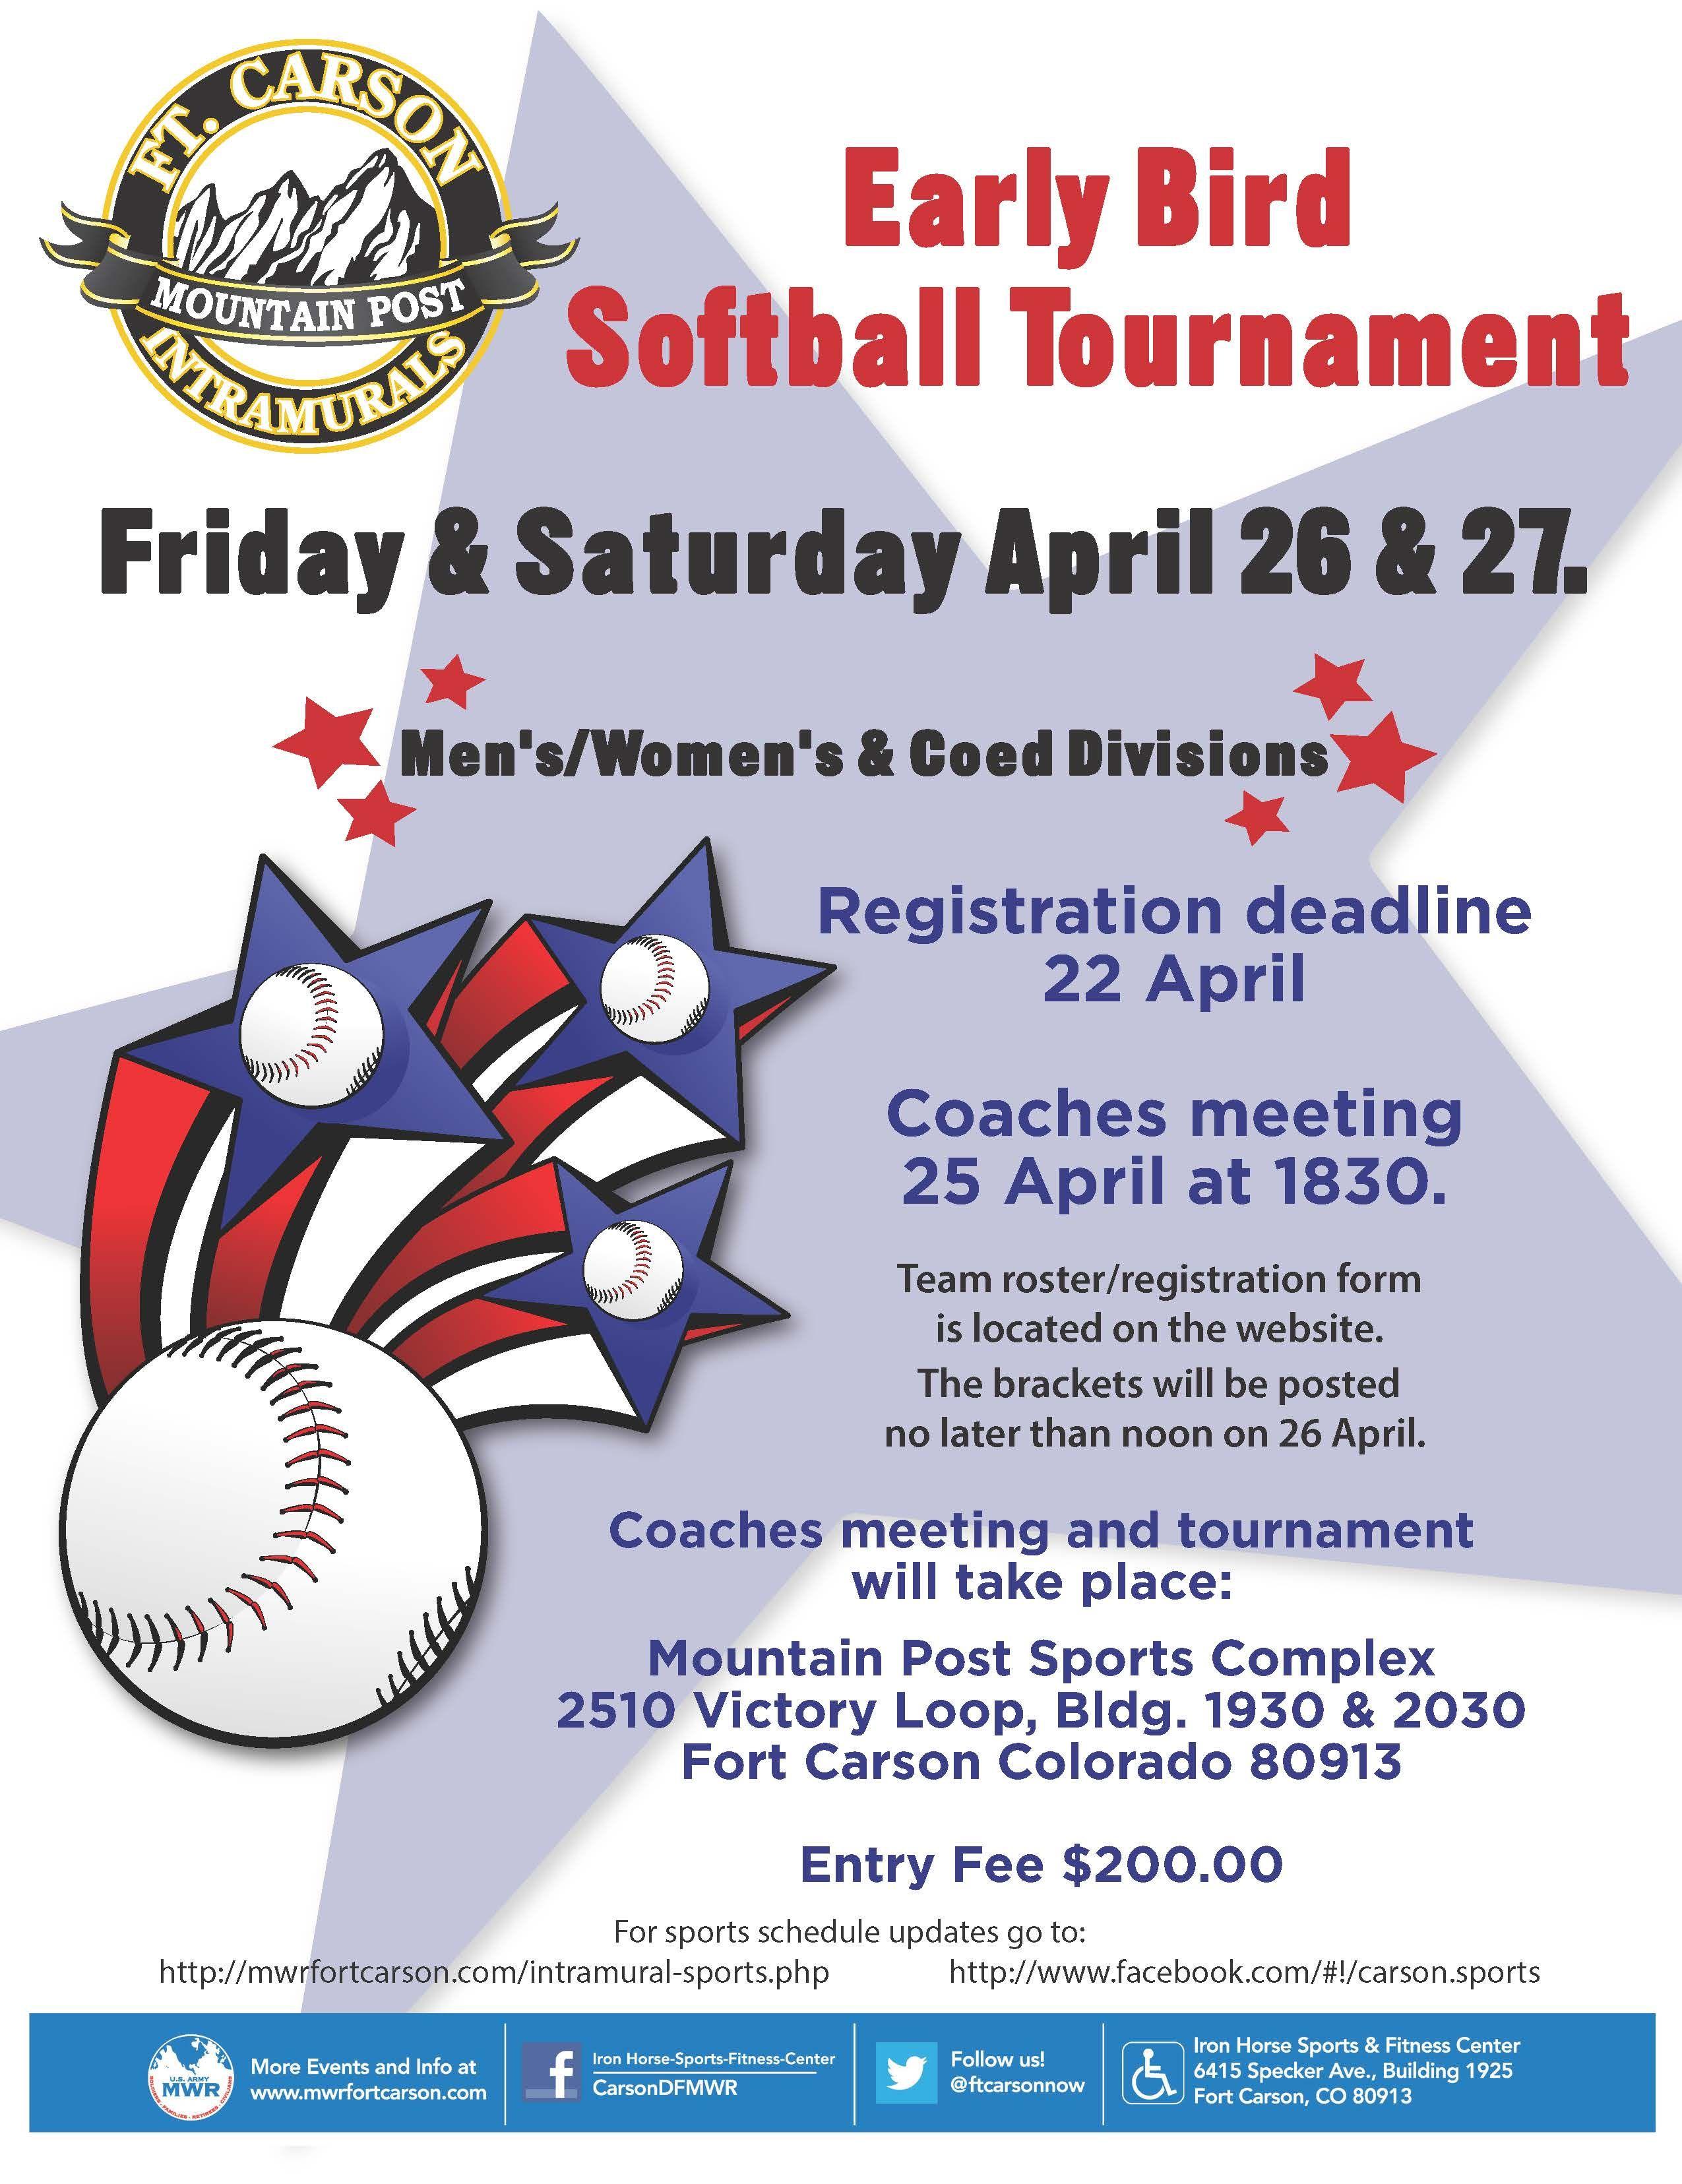 Early Bird Softball Tournament Fort Carson Softball Tournaments Tournaments Softball